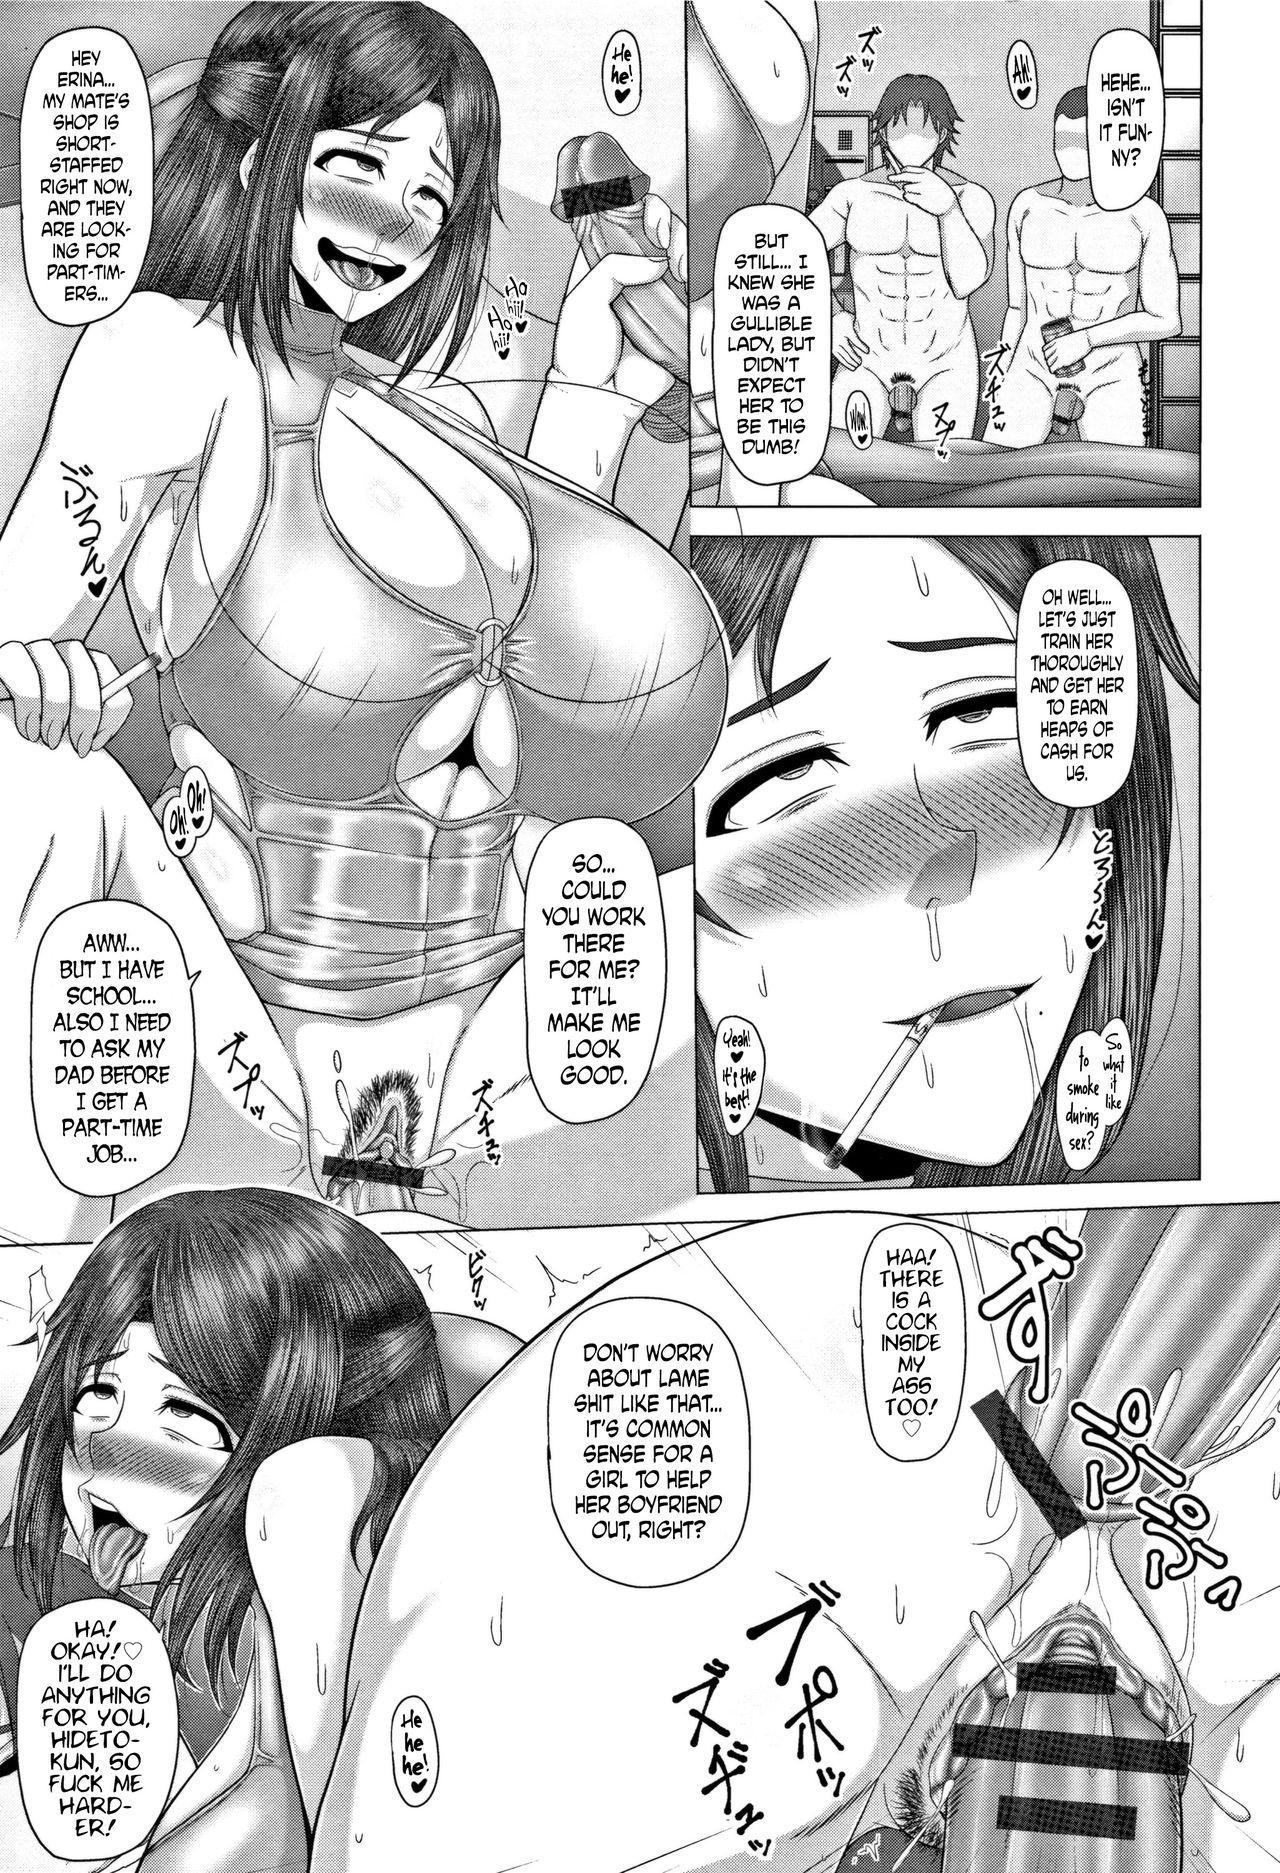 [Inoue Nanaki] Joushiki Daha! Kuro Gal Bitch-ka Seikatsu Ch. 1-3, 5-8 [English] [Dark Mac + N04h] 70